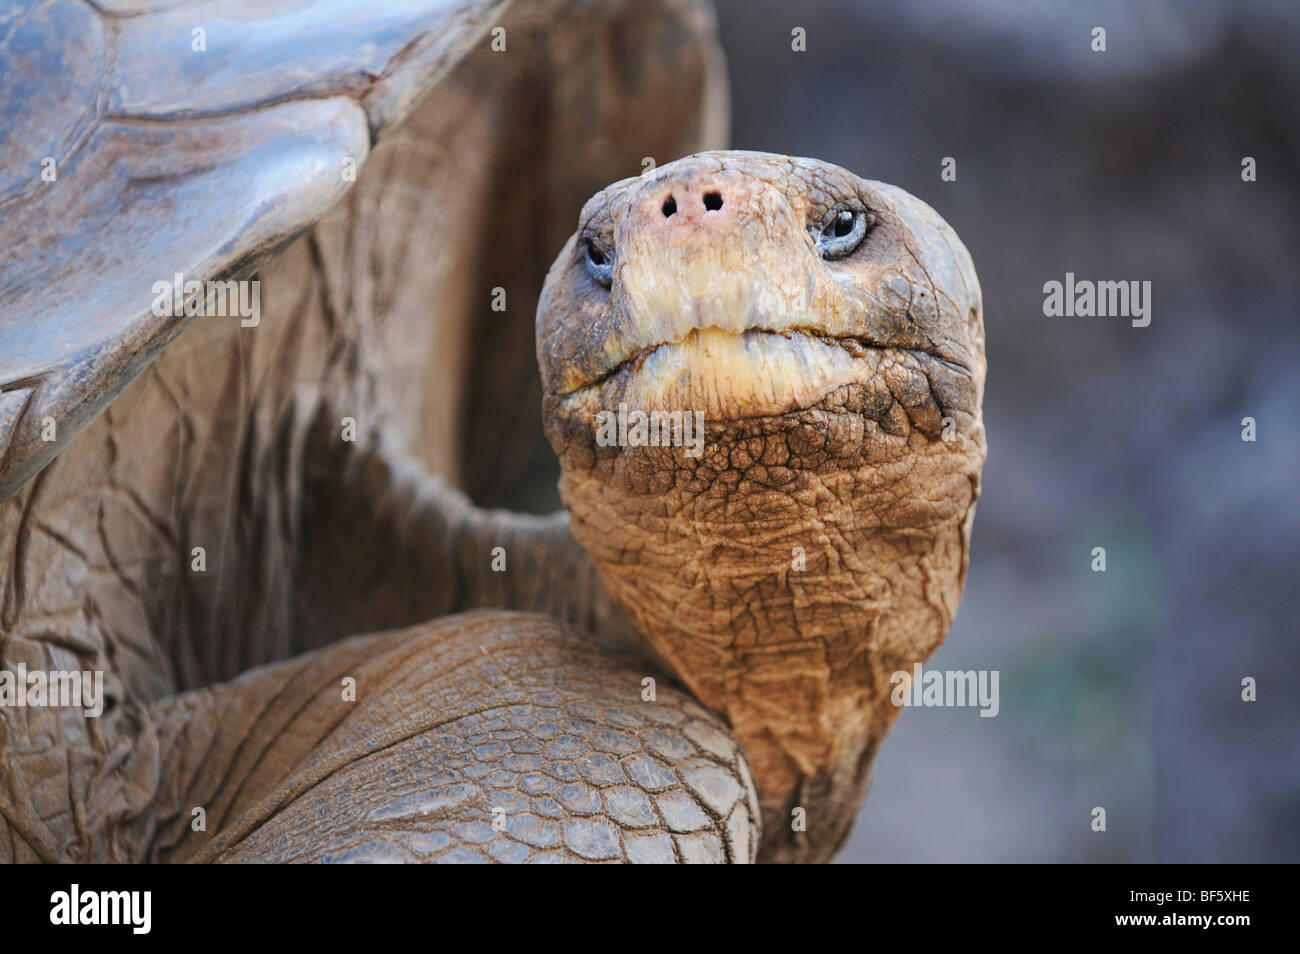 Galapagos Giant Tortoise (Geochelone elephantopus), adult, Galapagos Islands, Ecuador, South America - Stock Image